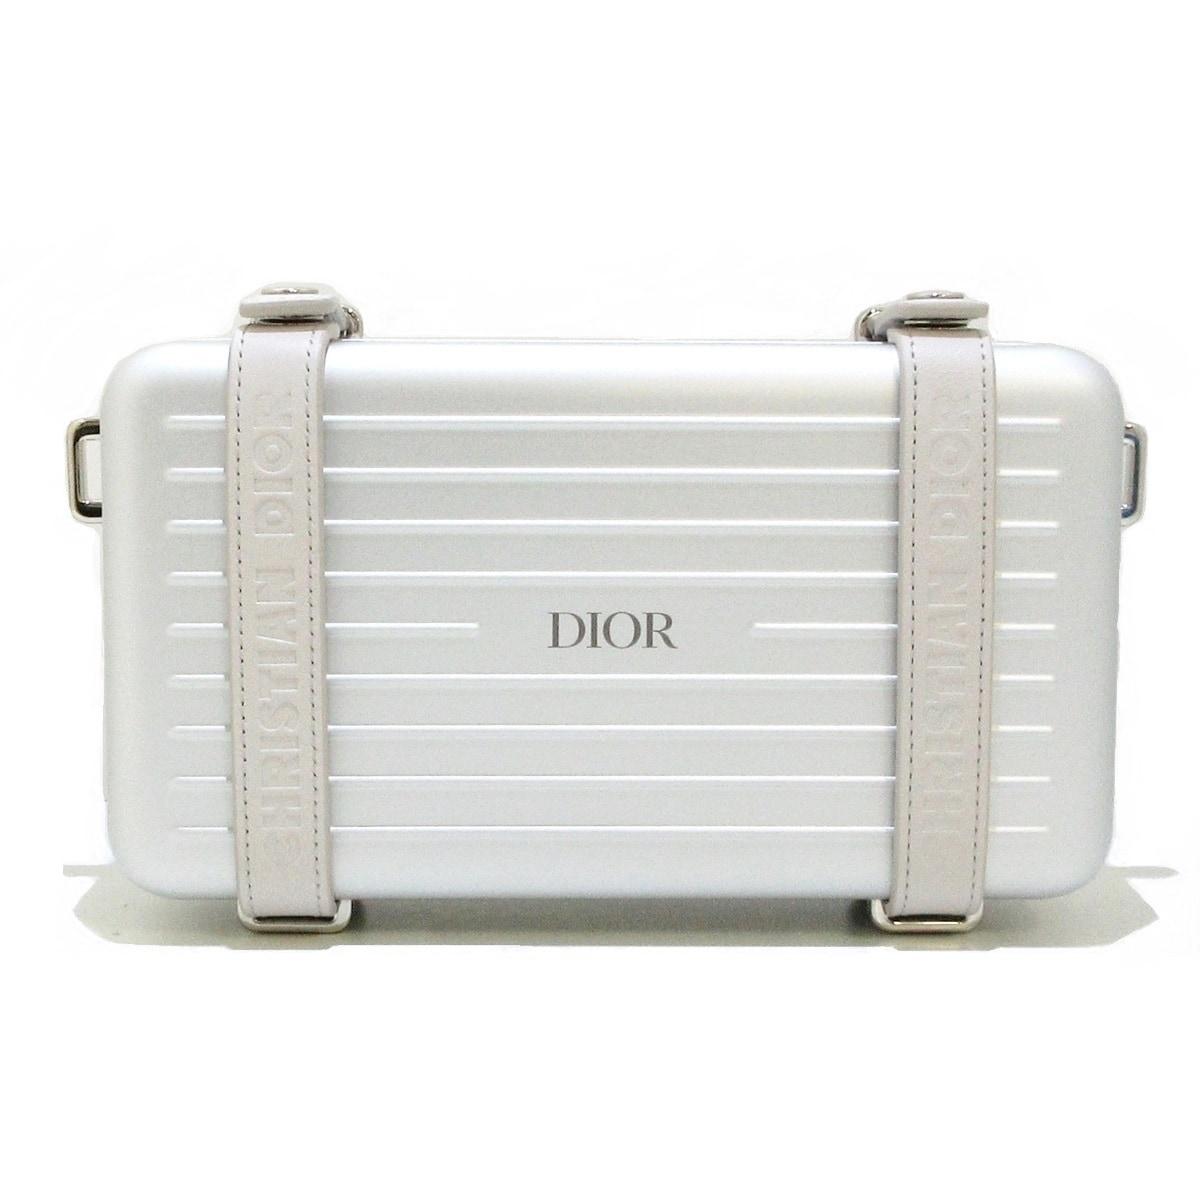 DIOR/ChristianDior(ディオール/クリスチャンディオール)のパーソナルクラッチバッグ